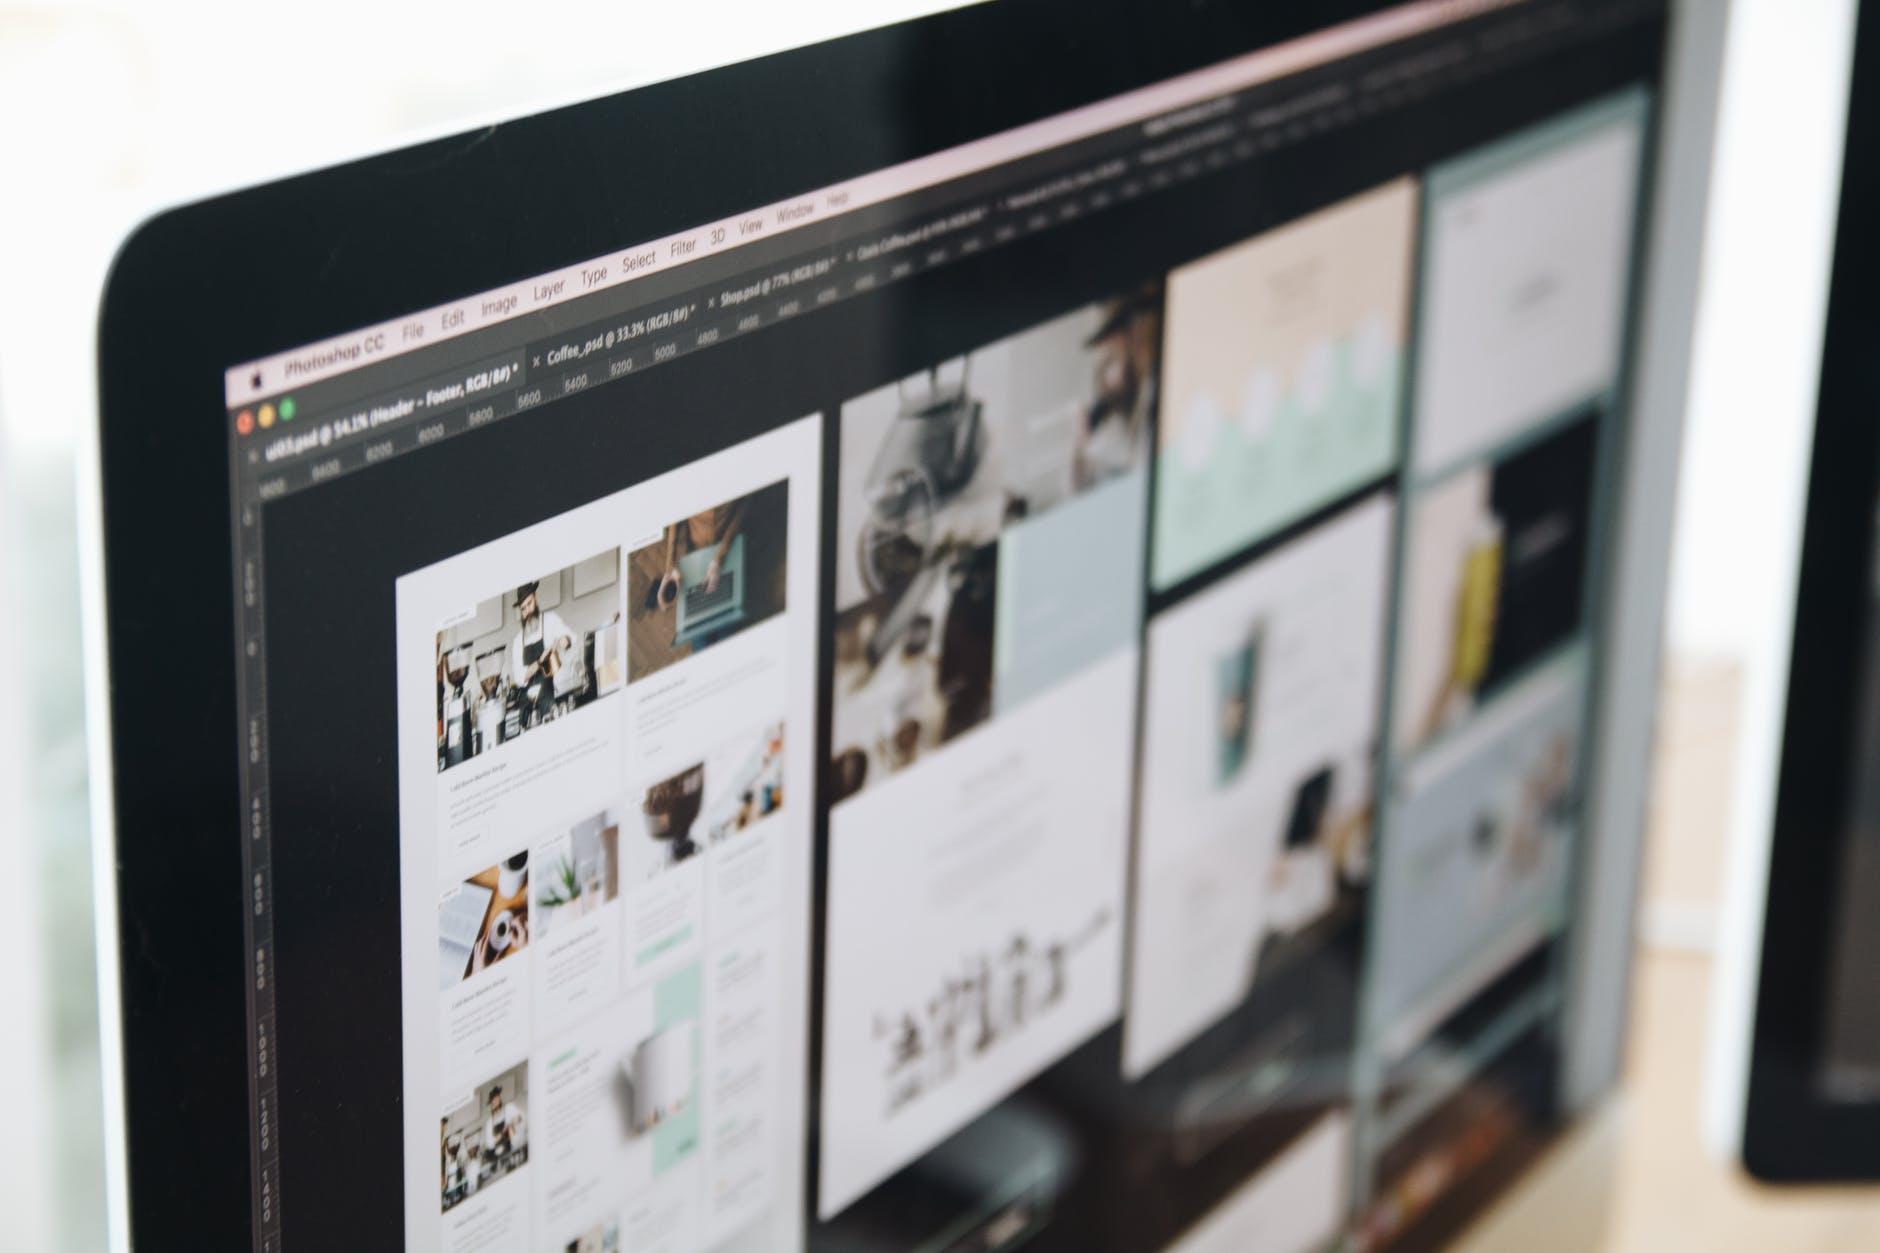 Intrinsic Webdesign - Responive Webdesign 2.0